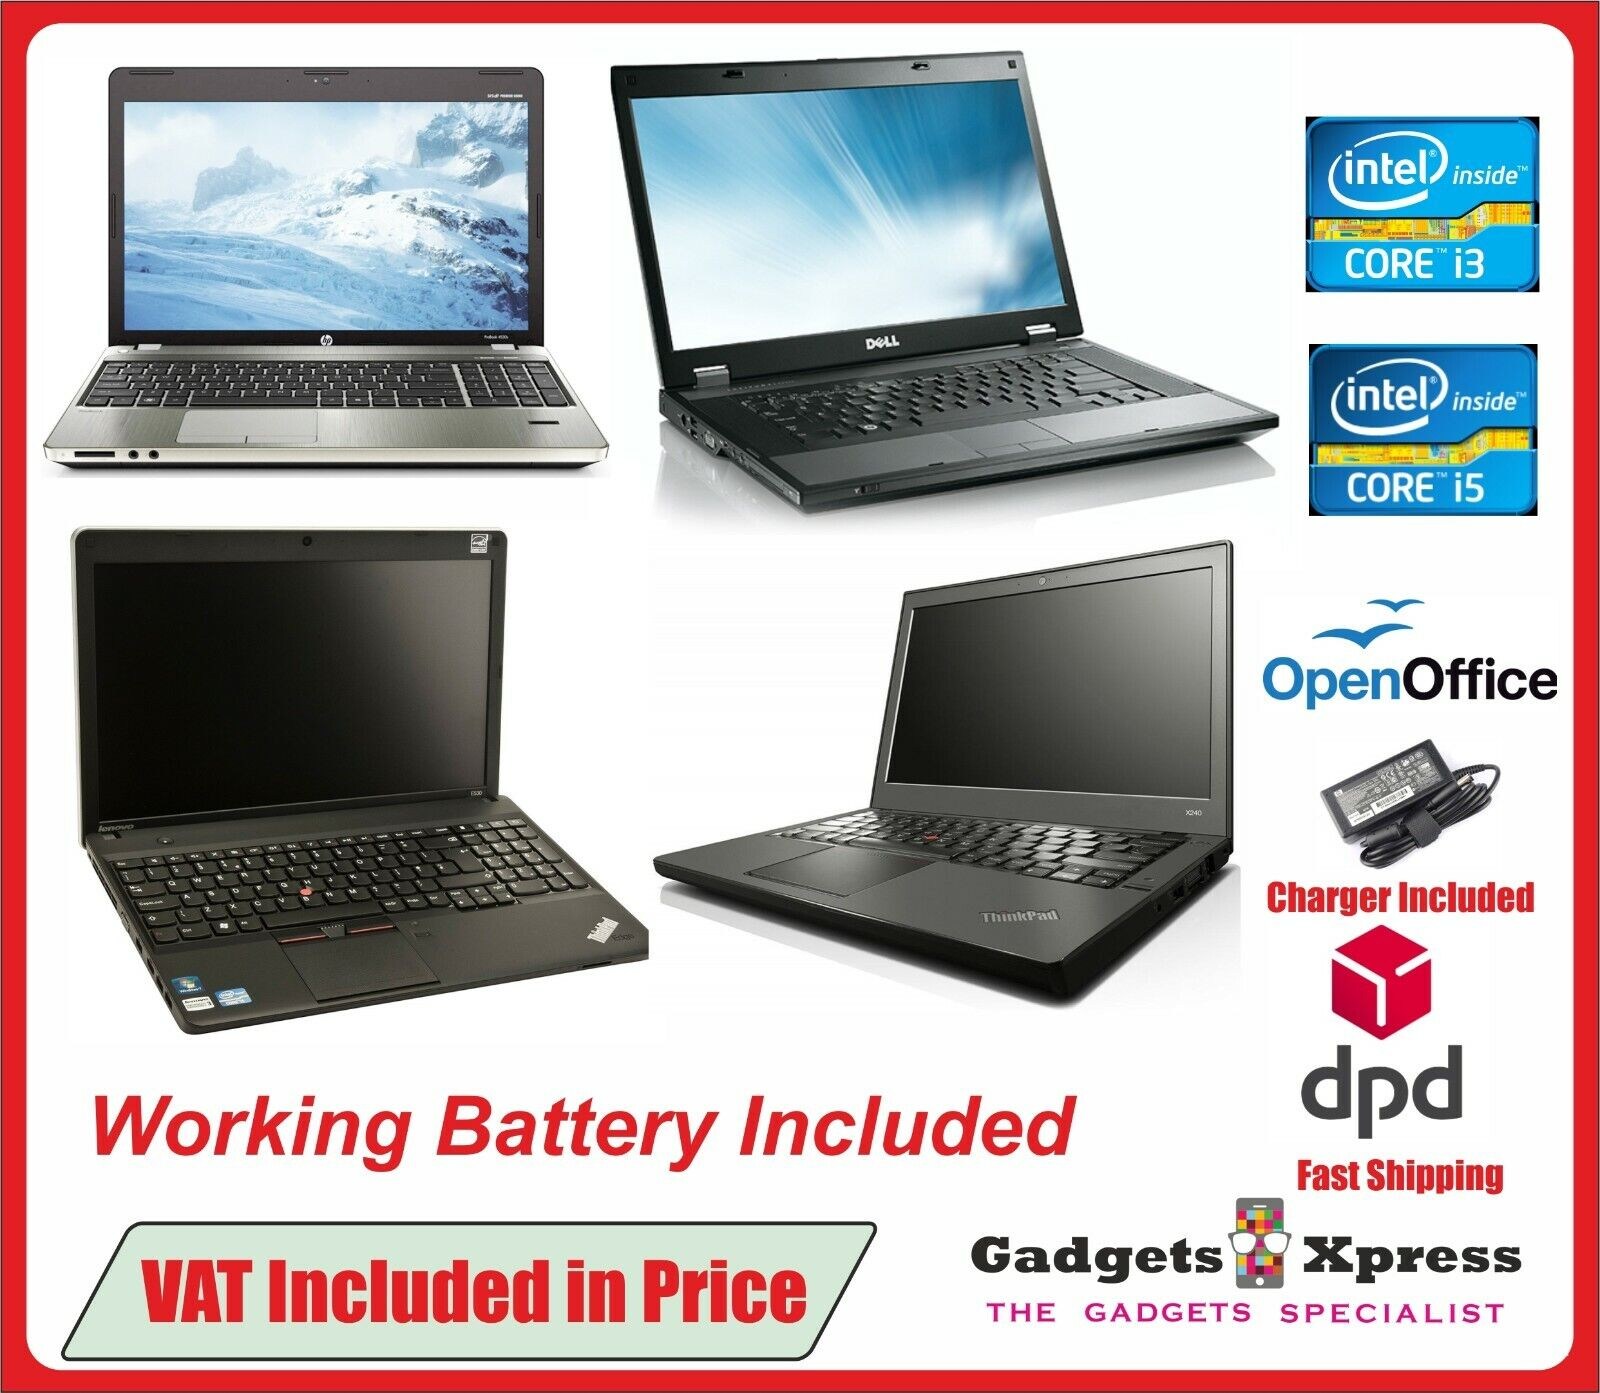 Laptop Windows - CHEAP FAST INTEL CORE Core2 Duo i3 i5 LAPTOP WINDOWS 10 4/8GB RAM HDD/SSD WiFi